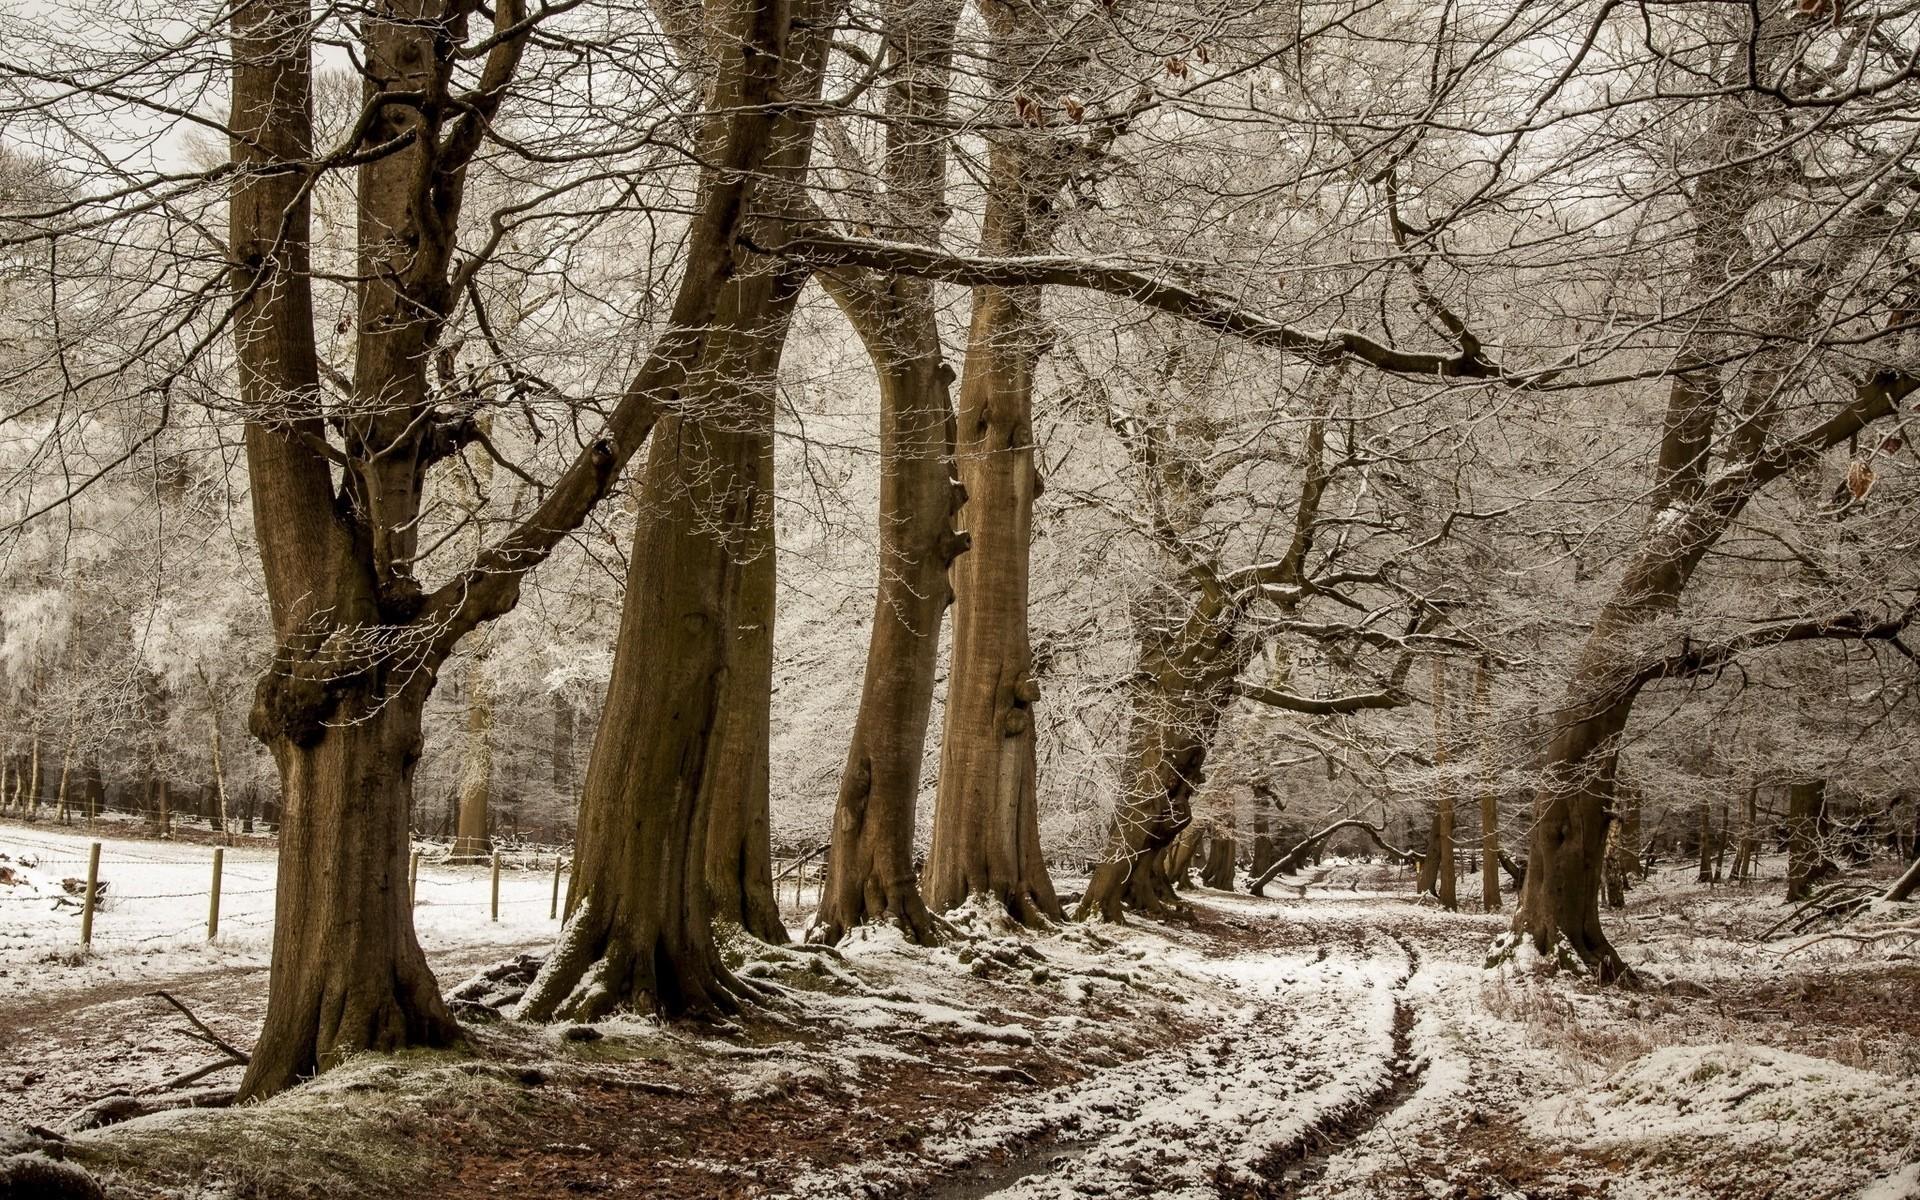 Res: 1920x1200, Bild: Brown-Bäume Weg Zaun Snowy wallpapers and stock photos. «